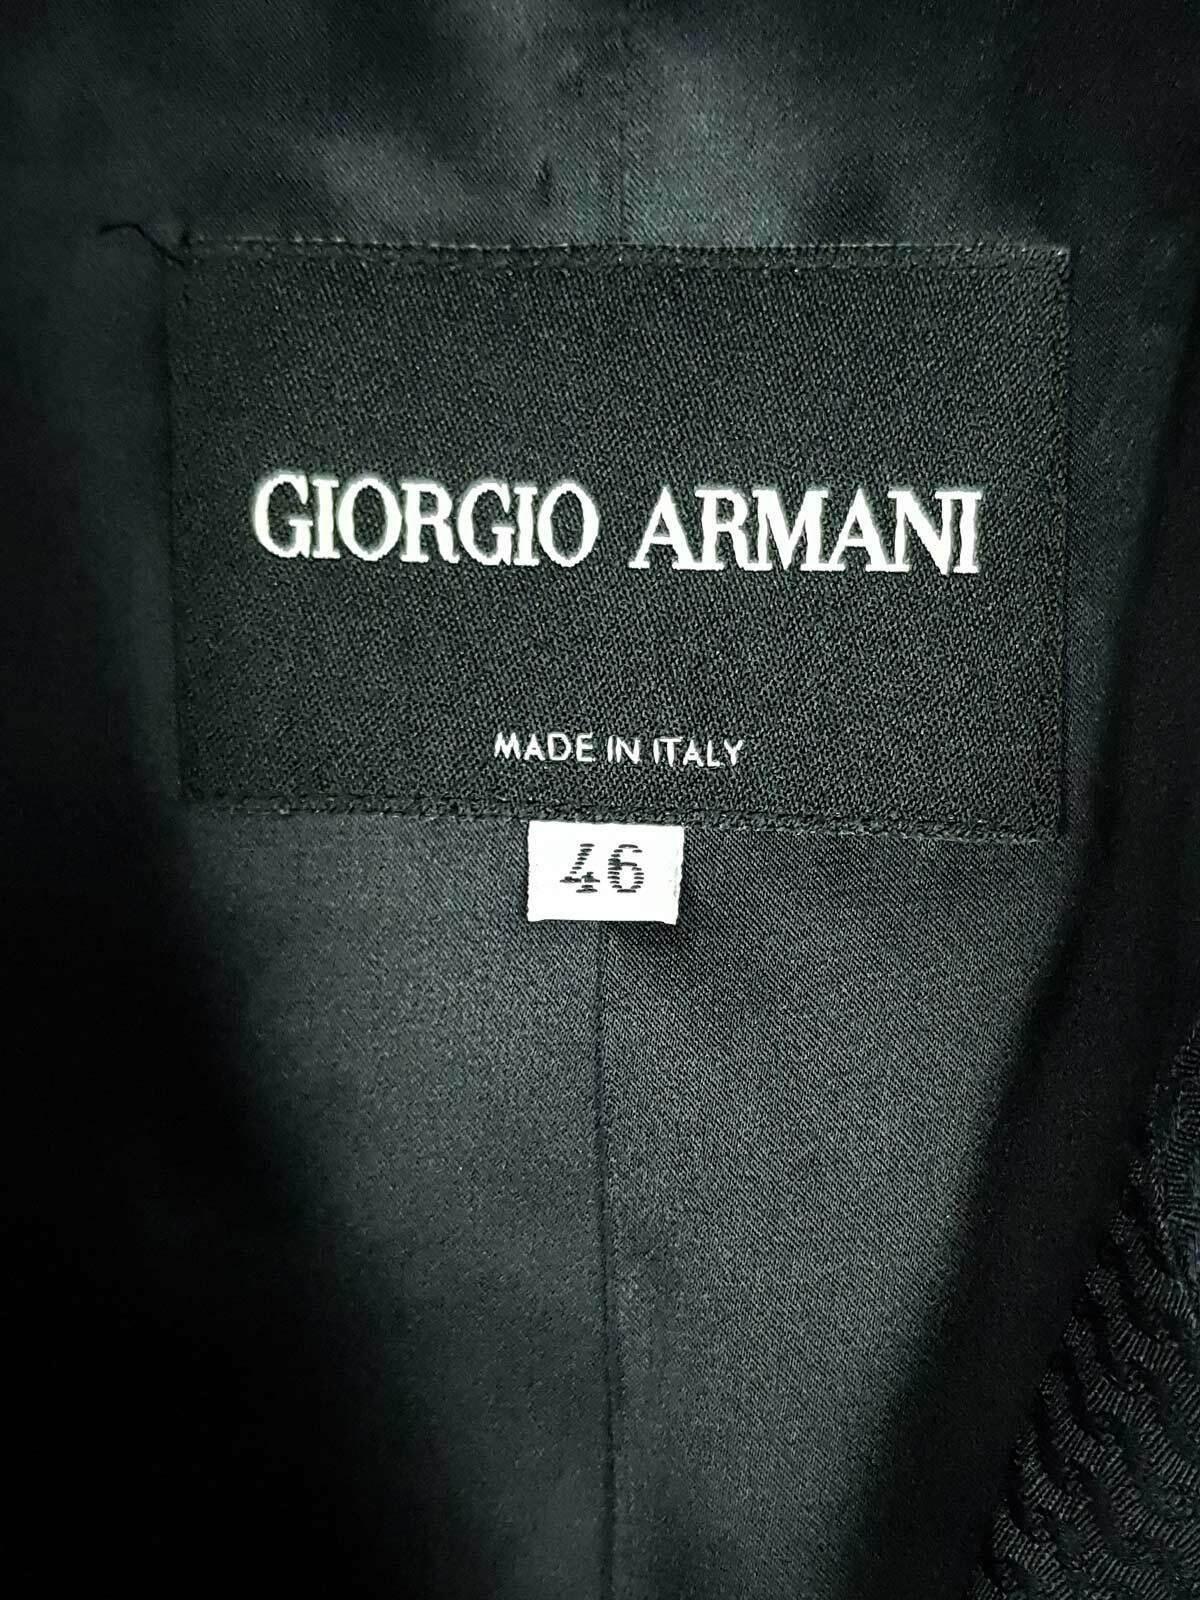 Giorgio Armani Mélange de Soie Veste Boutonnière Simple